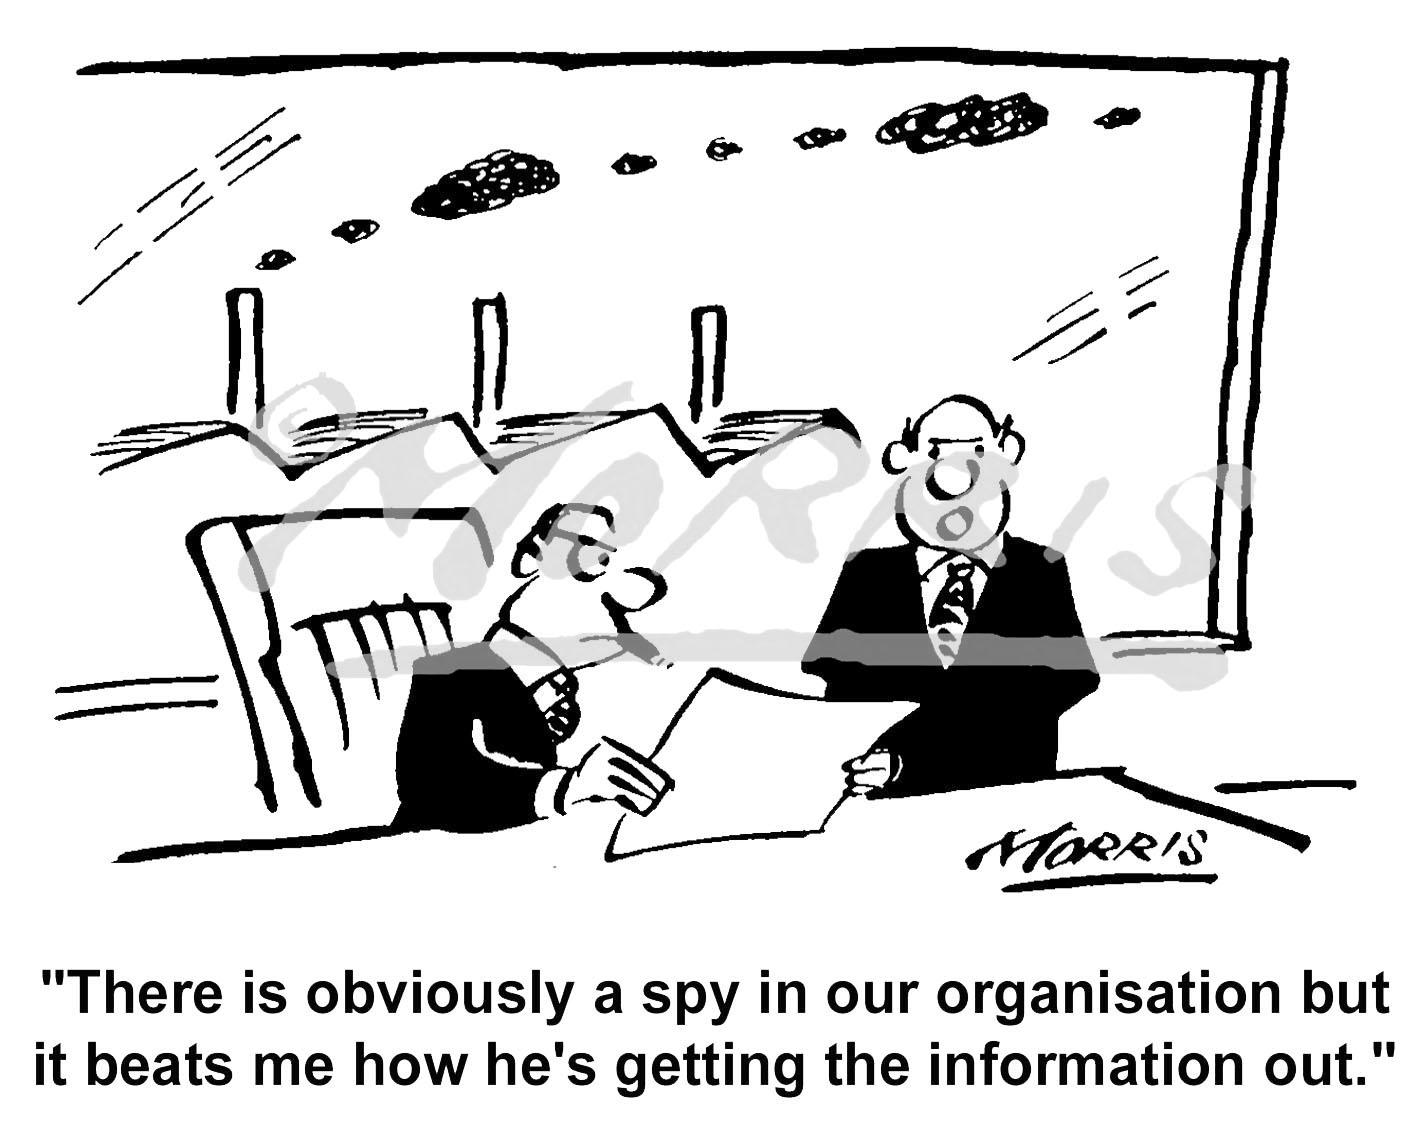 Company business cartoon ref: 1406bw